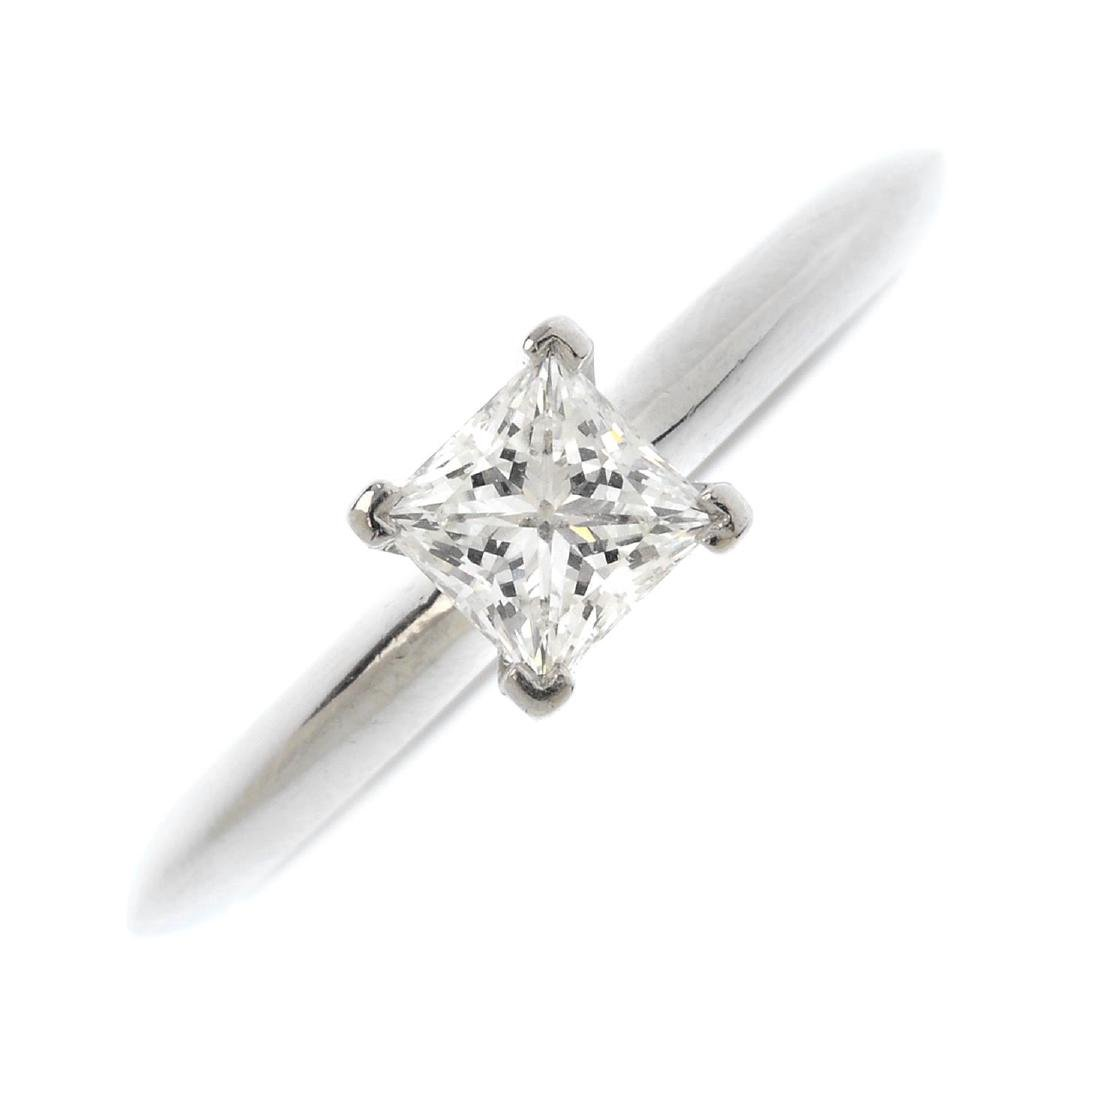 TIFFANY & CO. - a platinum diamond single-stone ring.